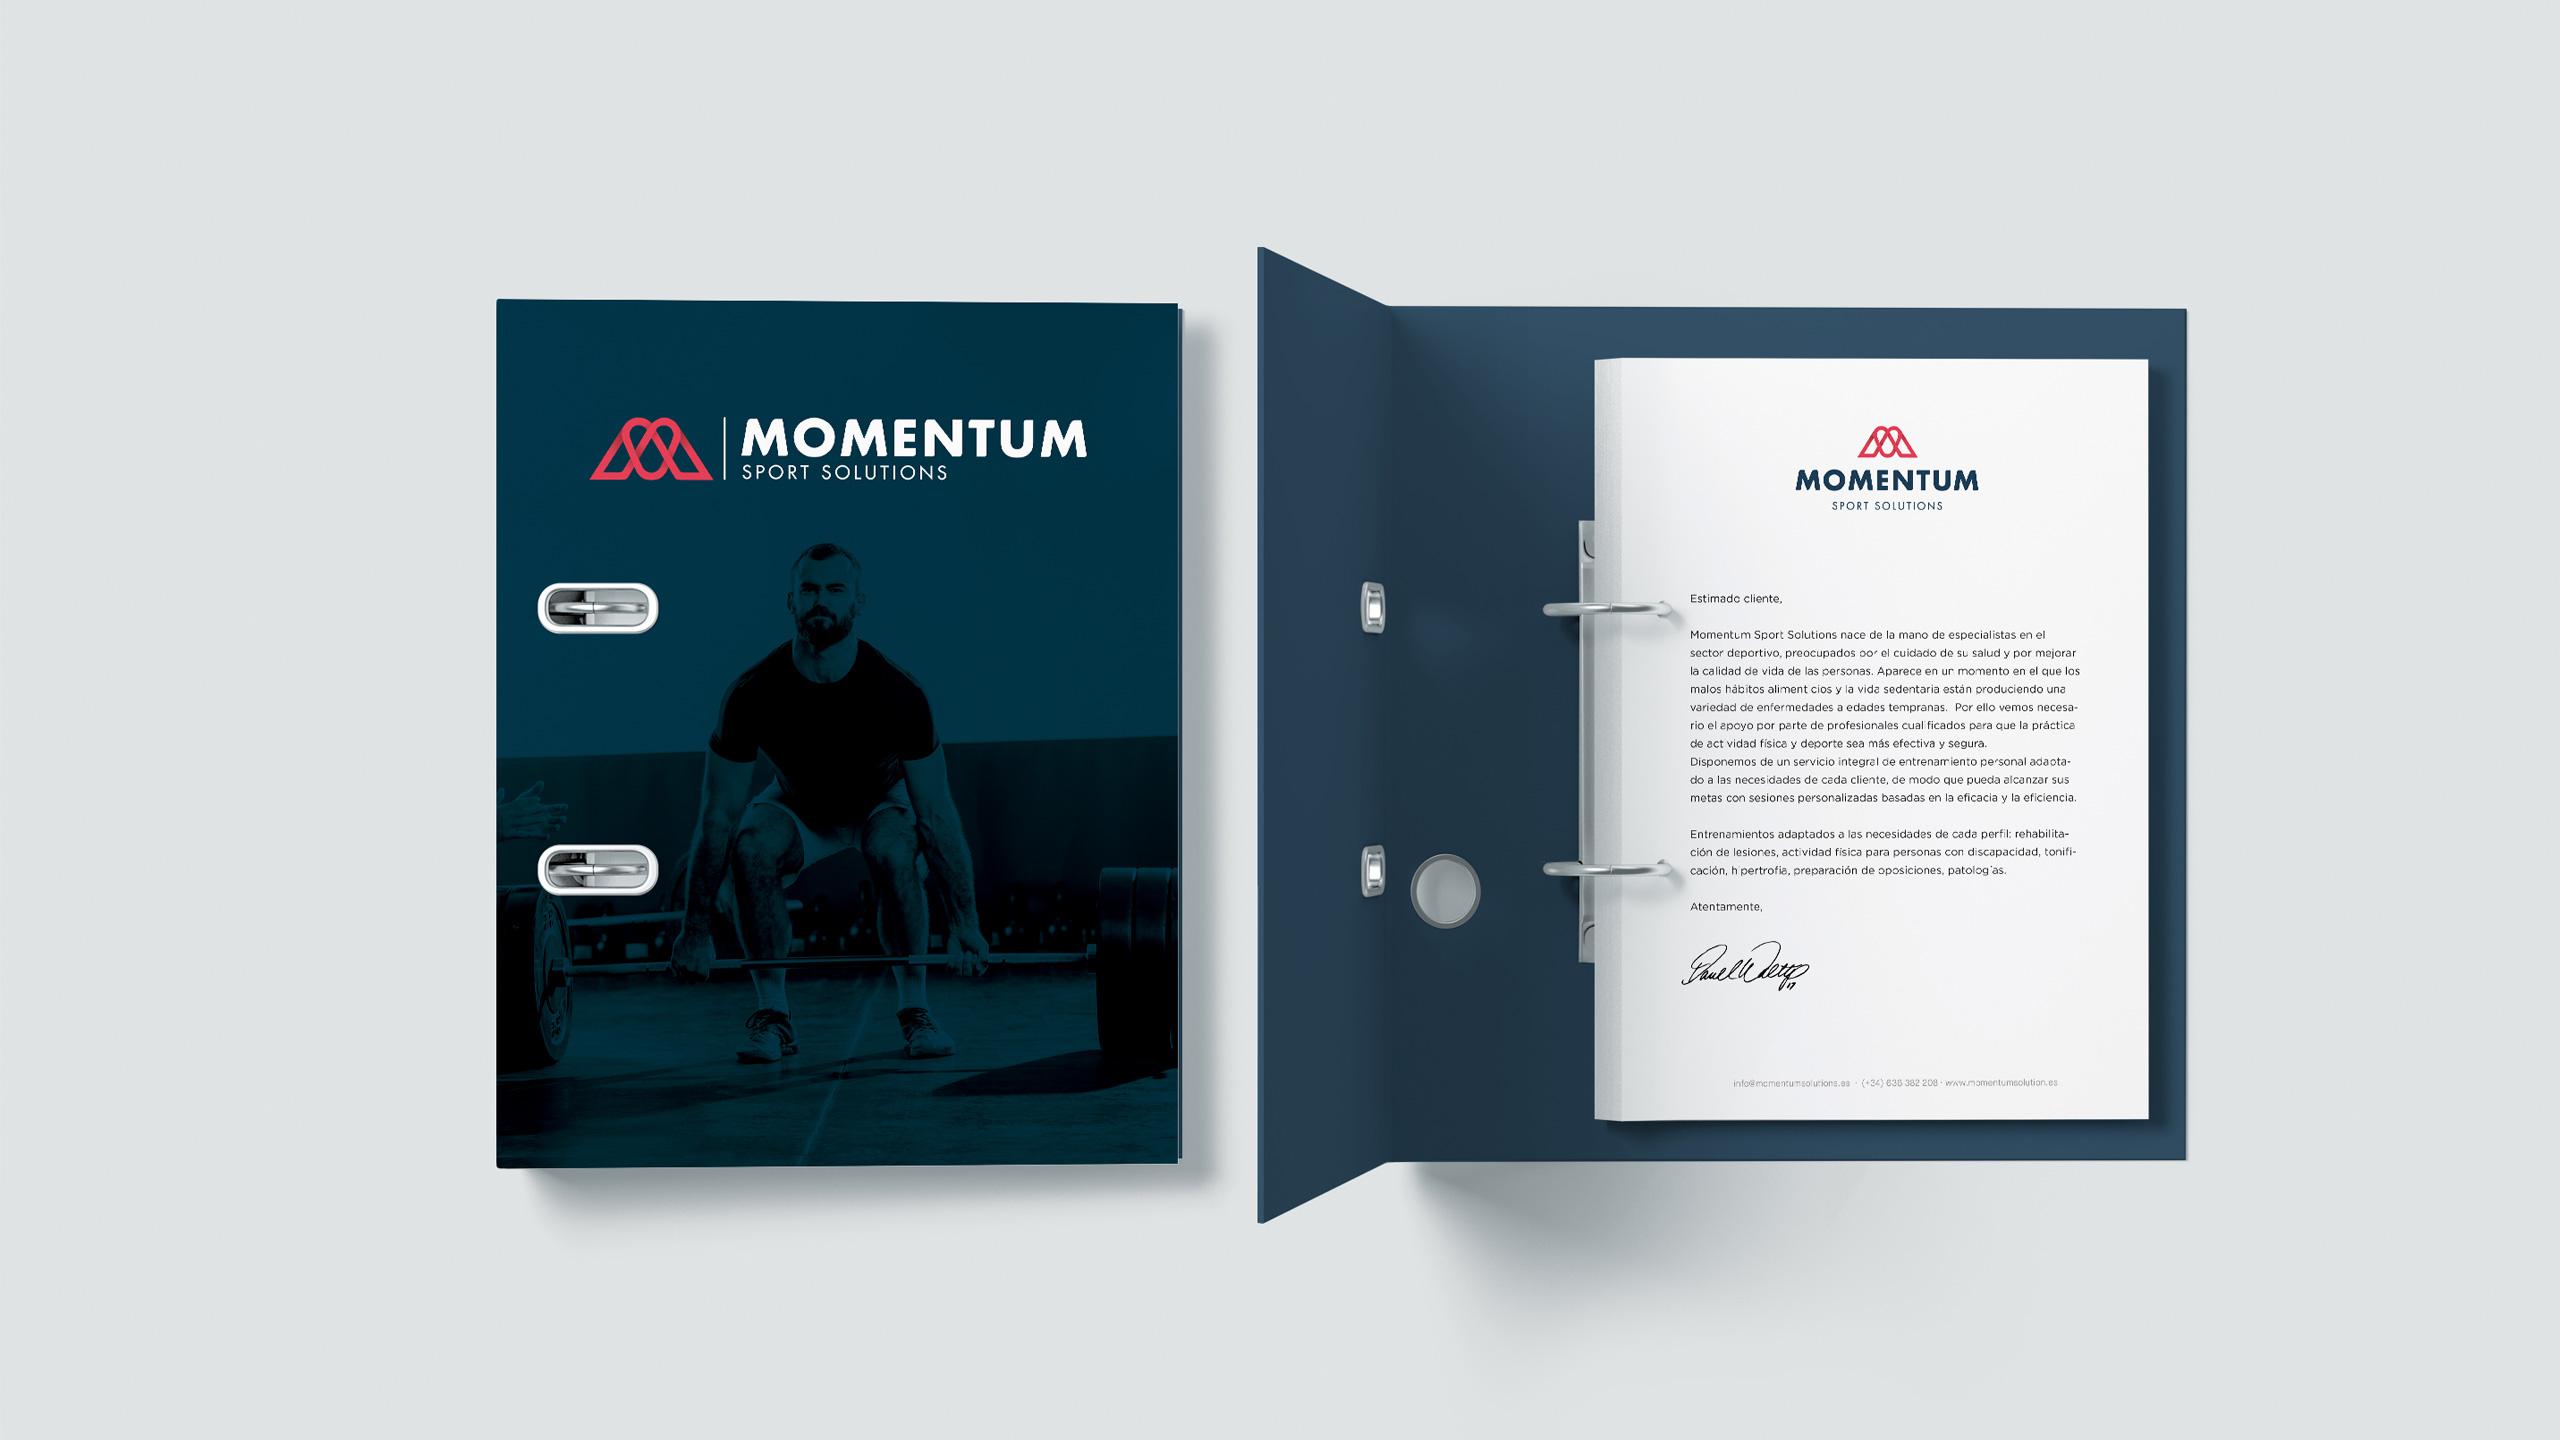 kamikaze_momentum_identidad_14